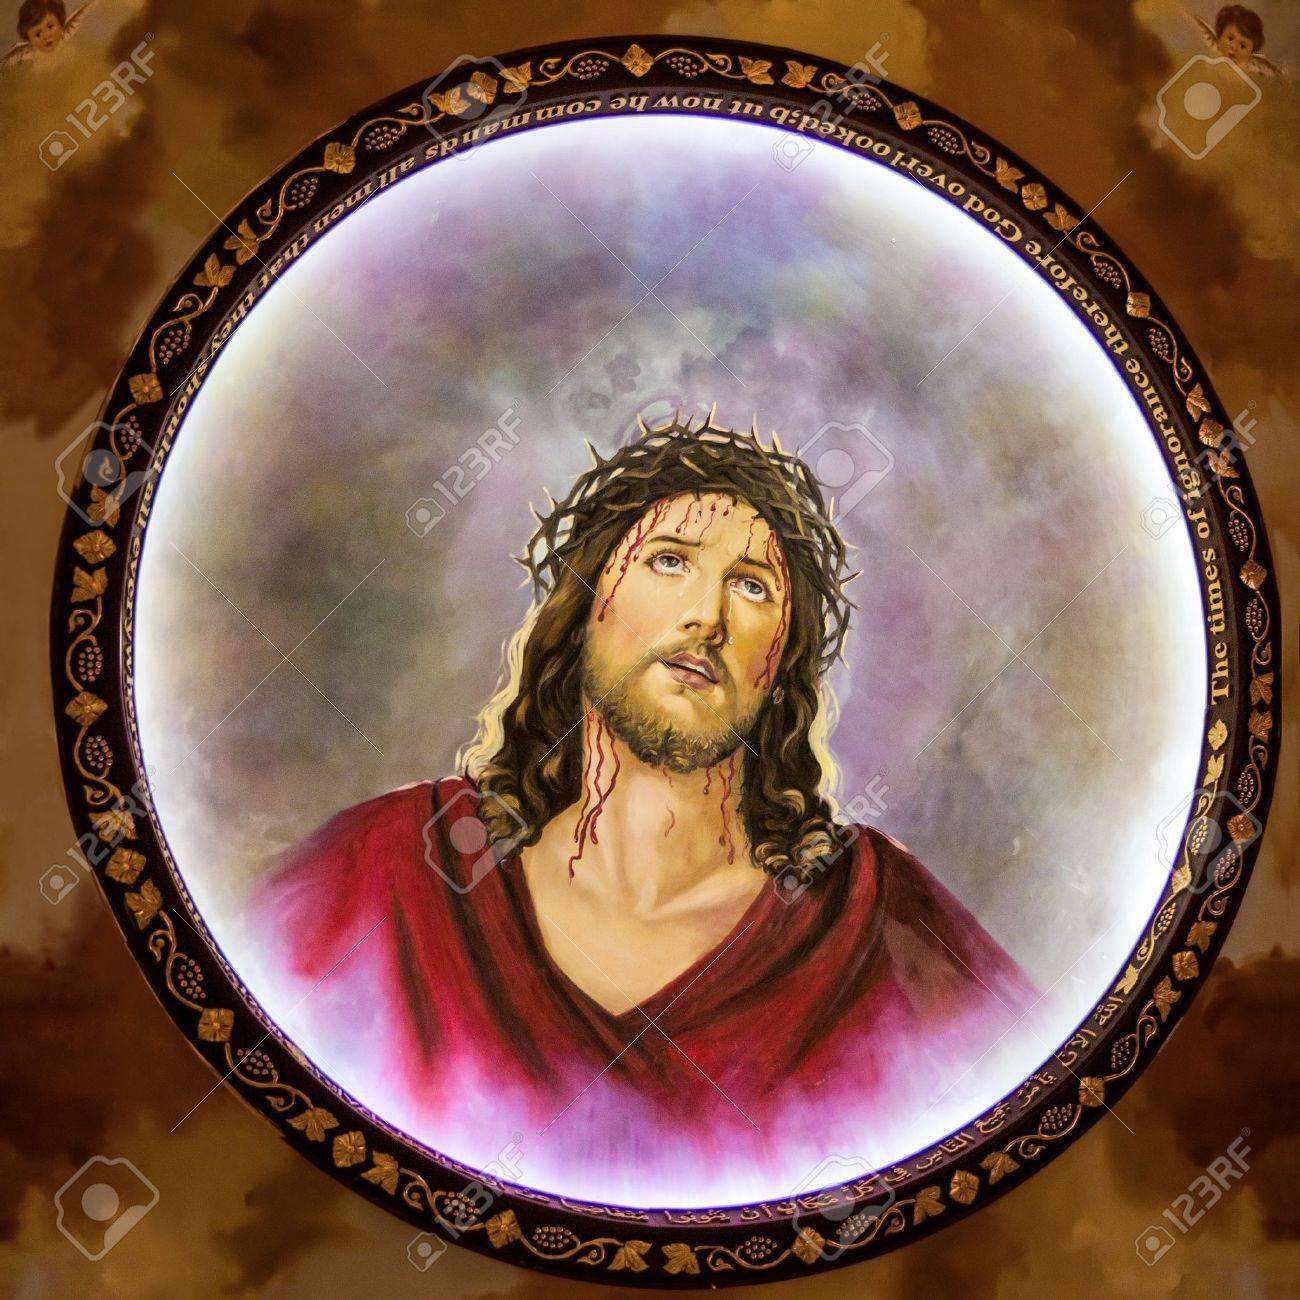 Jesus with crown of thorns, fresco in Coptic Church, Sharm El Sheikh, Sinai, Egypt - 12878215